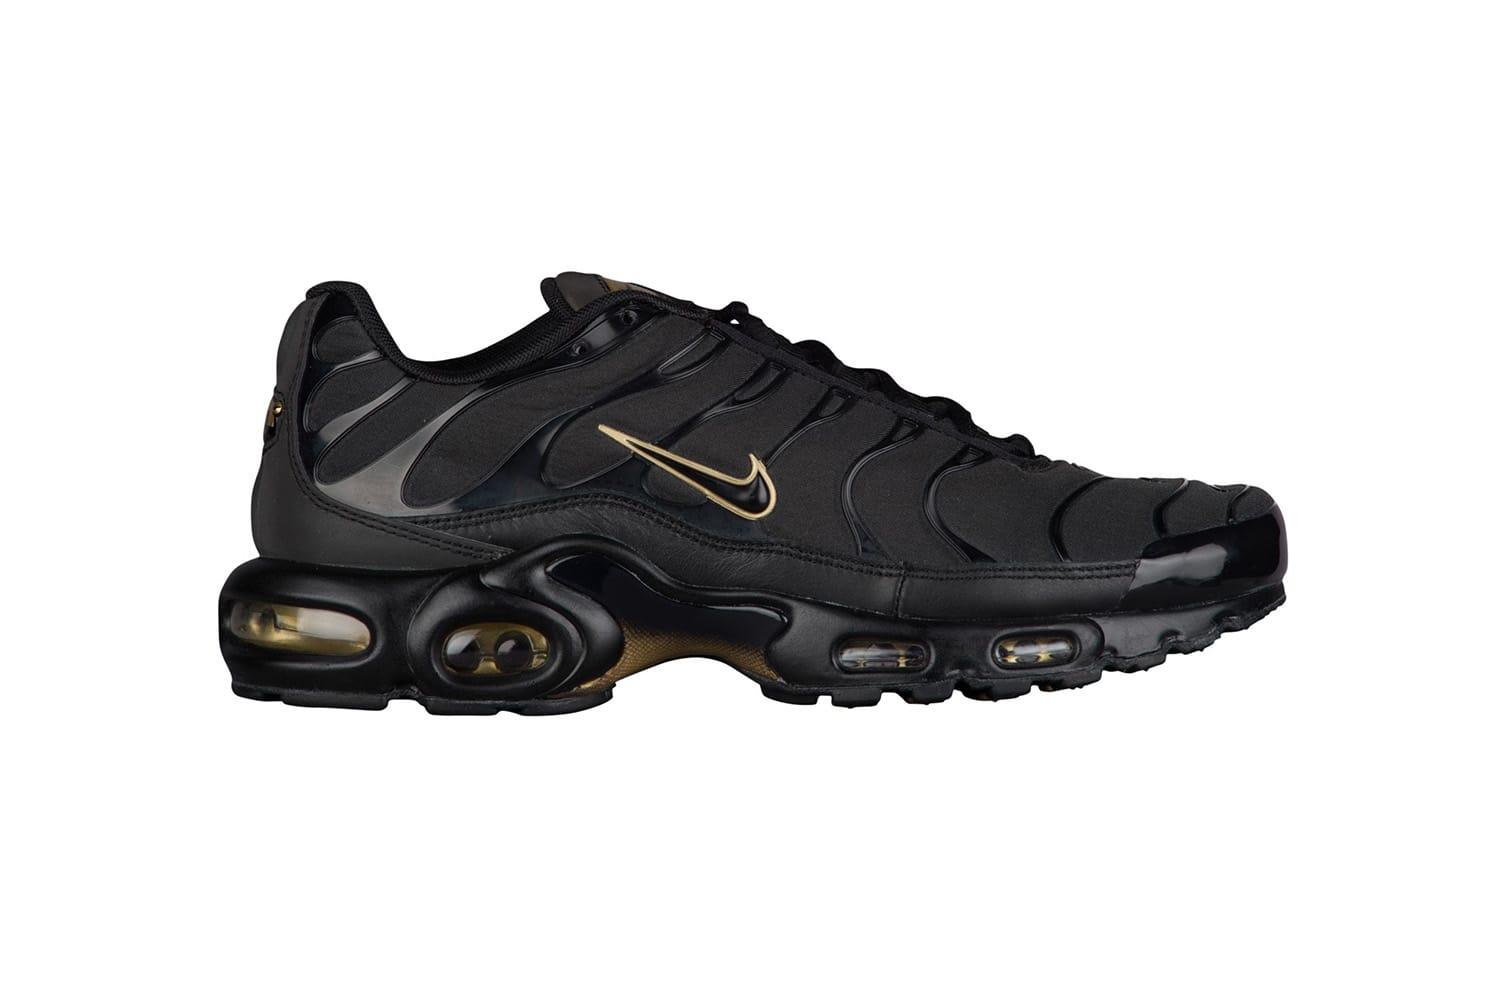 Nike Air Max Plus in Black \u0026 Metallic